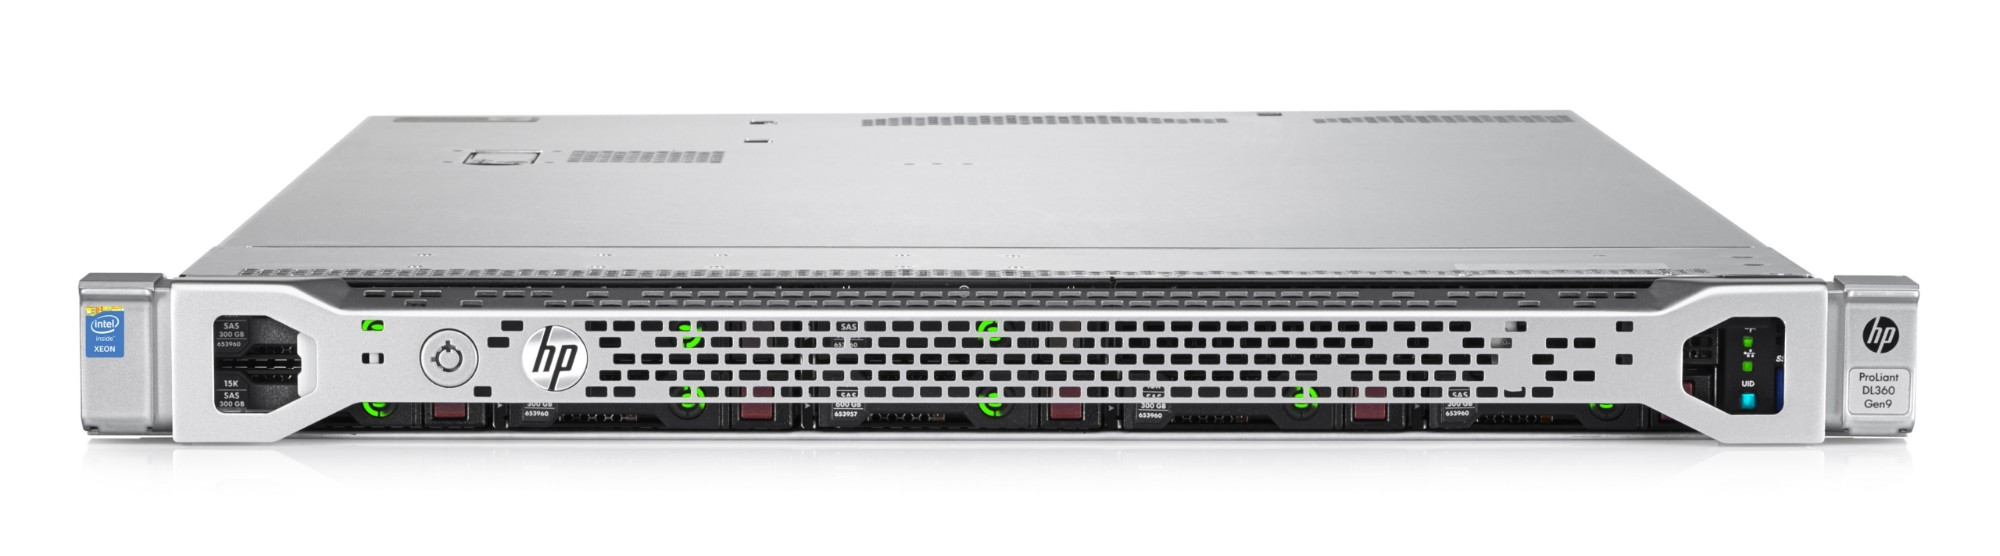 Hewlett Packard Enterprise ProLiant DL360 Gen9 server